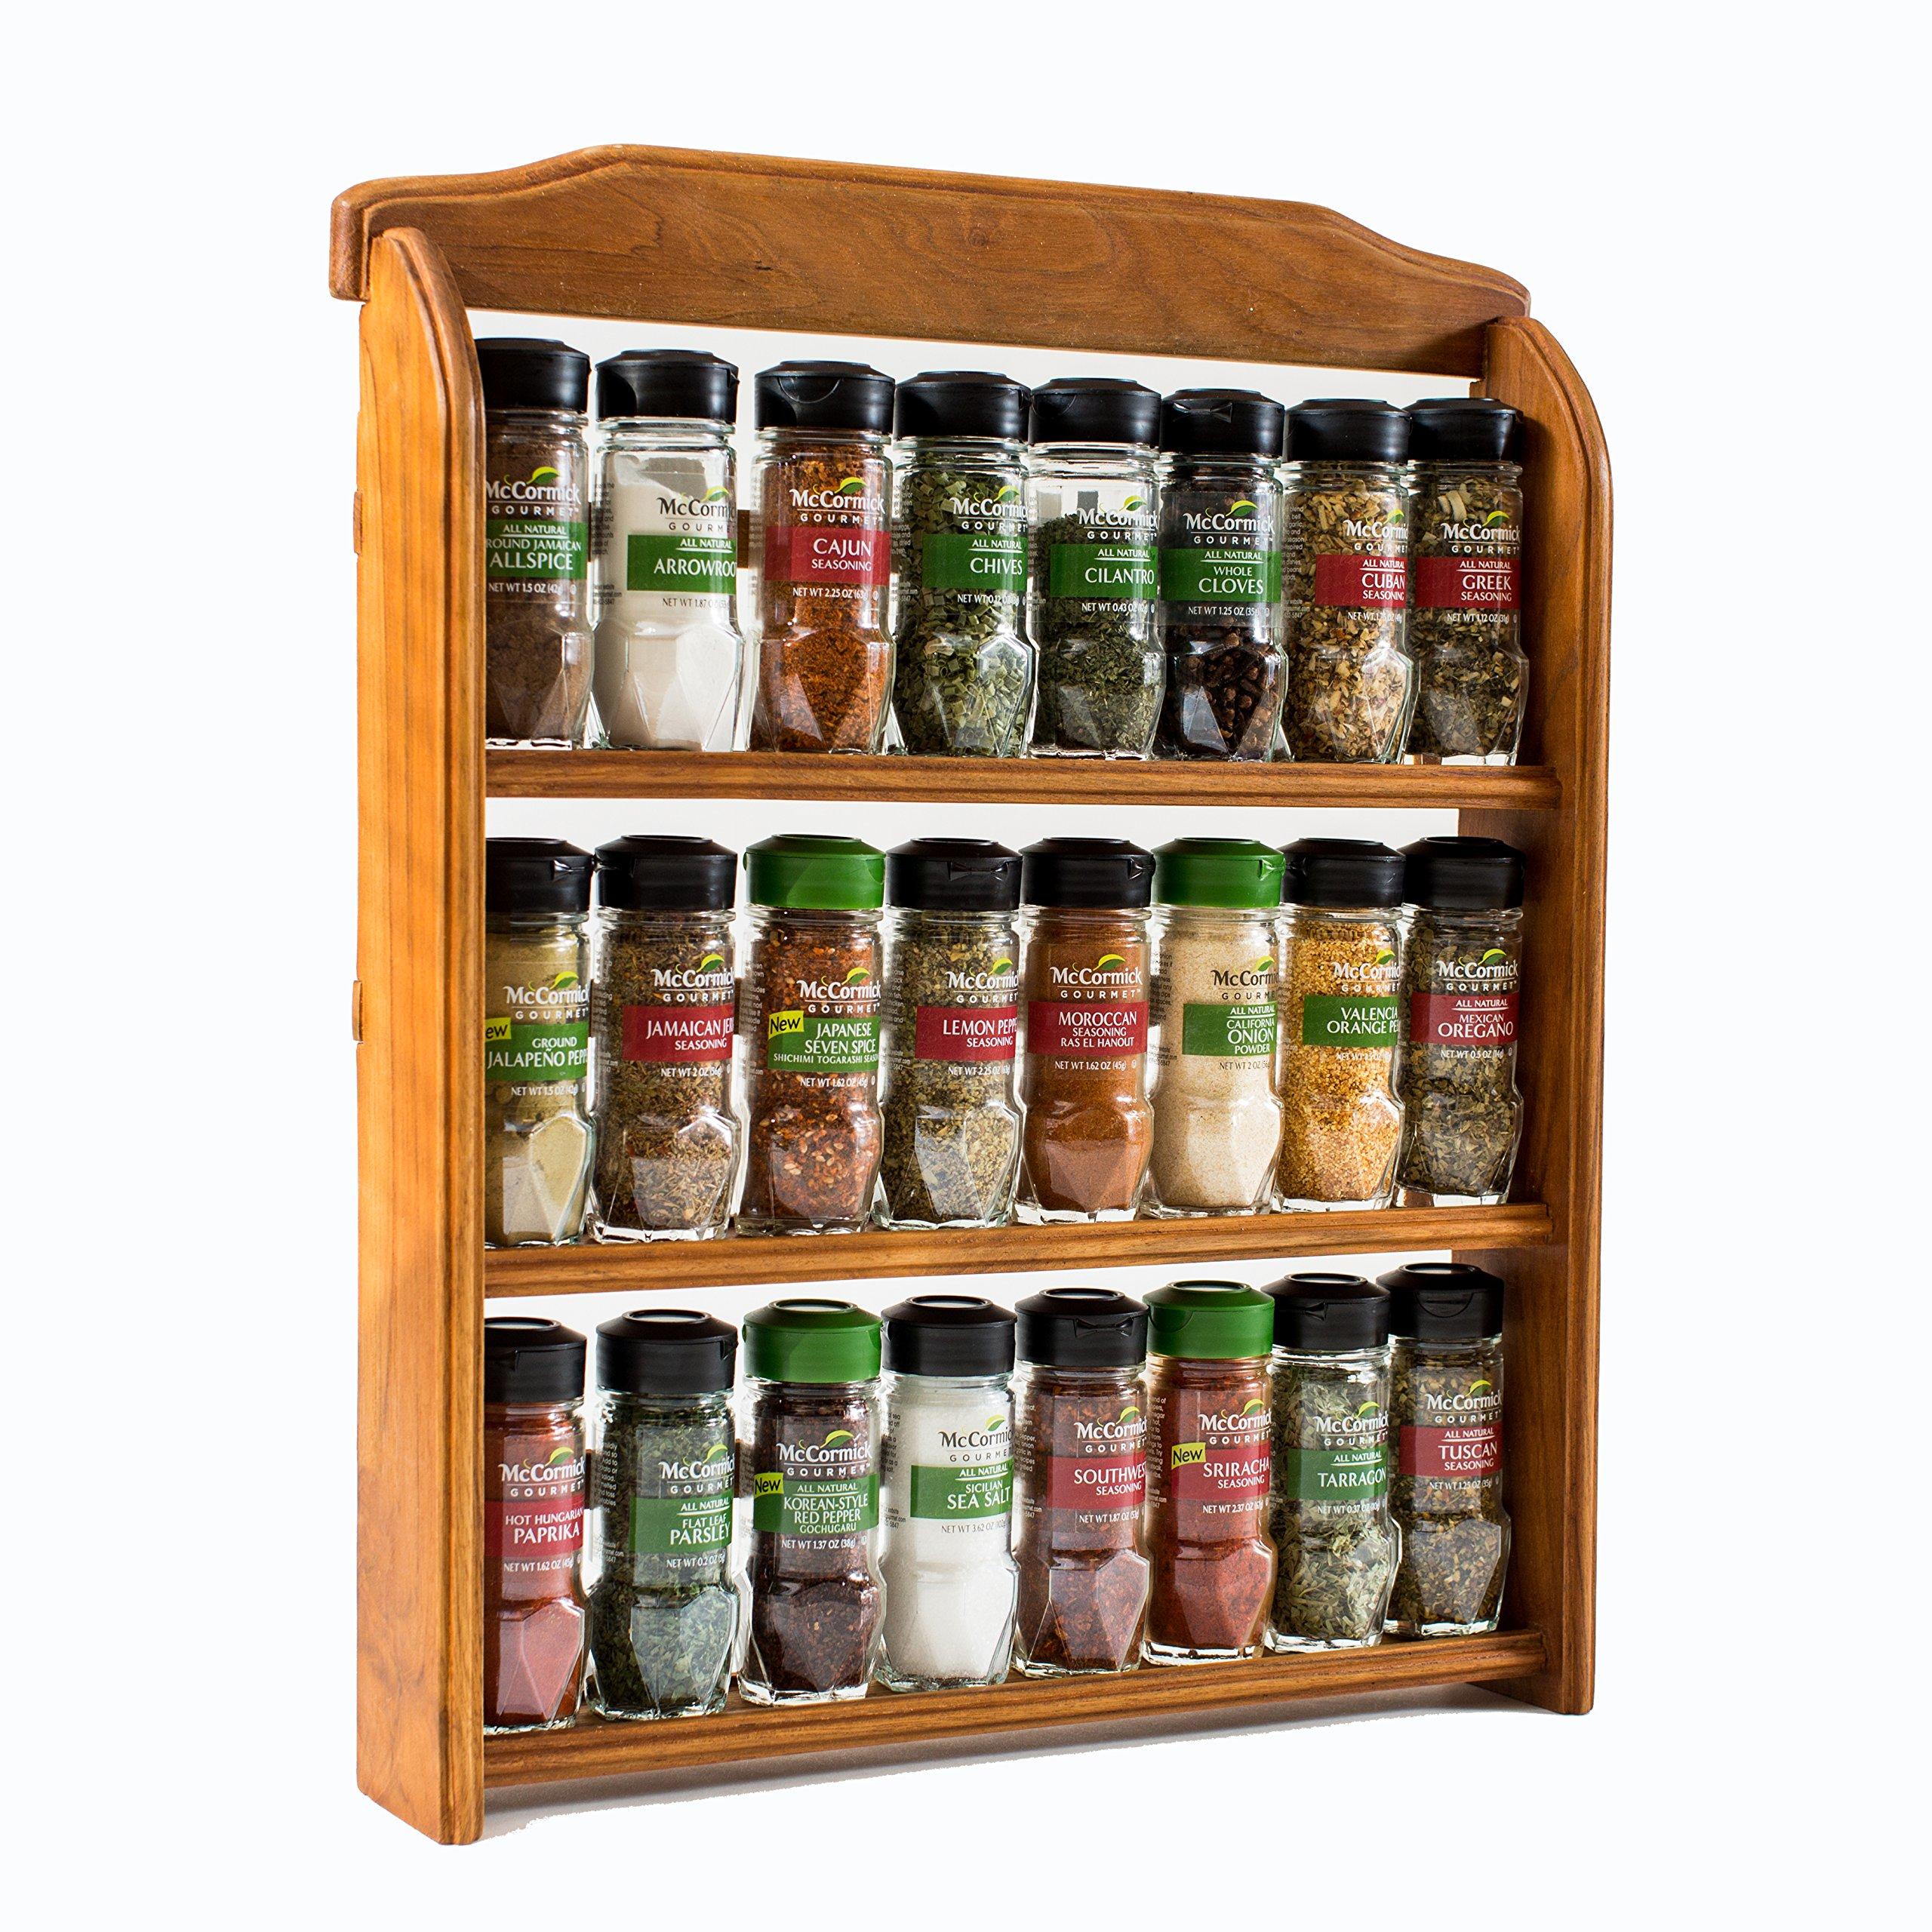 Galleon mccormick gourmet wood spice rack